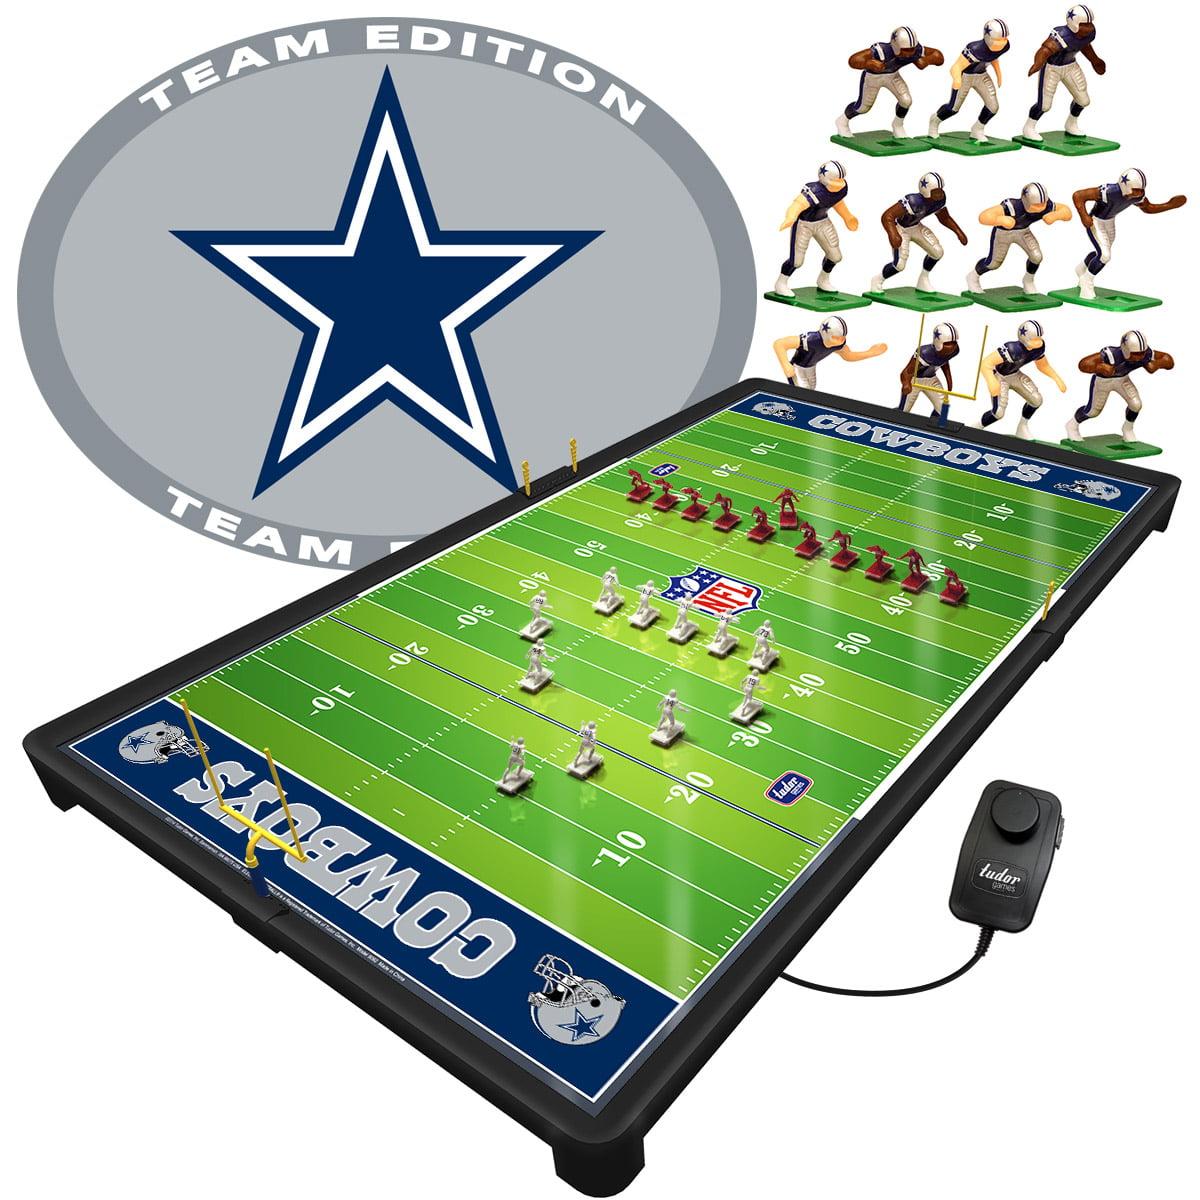 Dallas Cowboys NFL Pro Bowl Electric Football Game Set